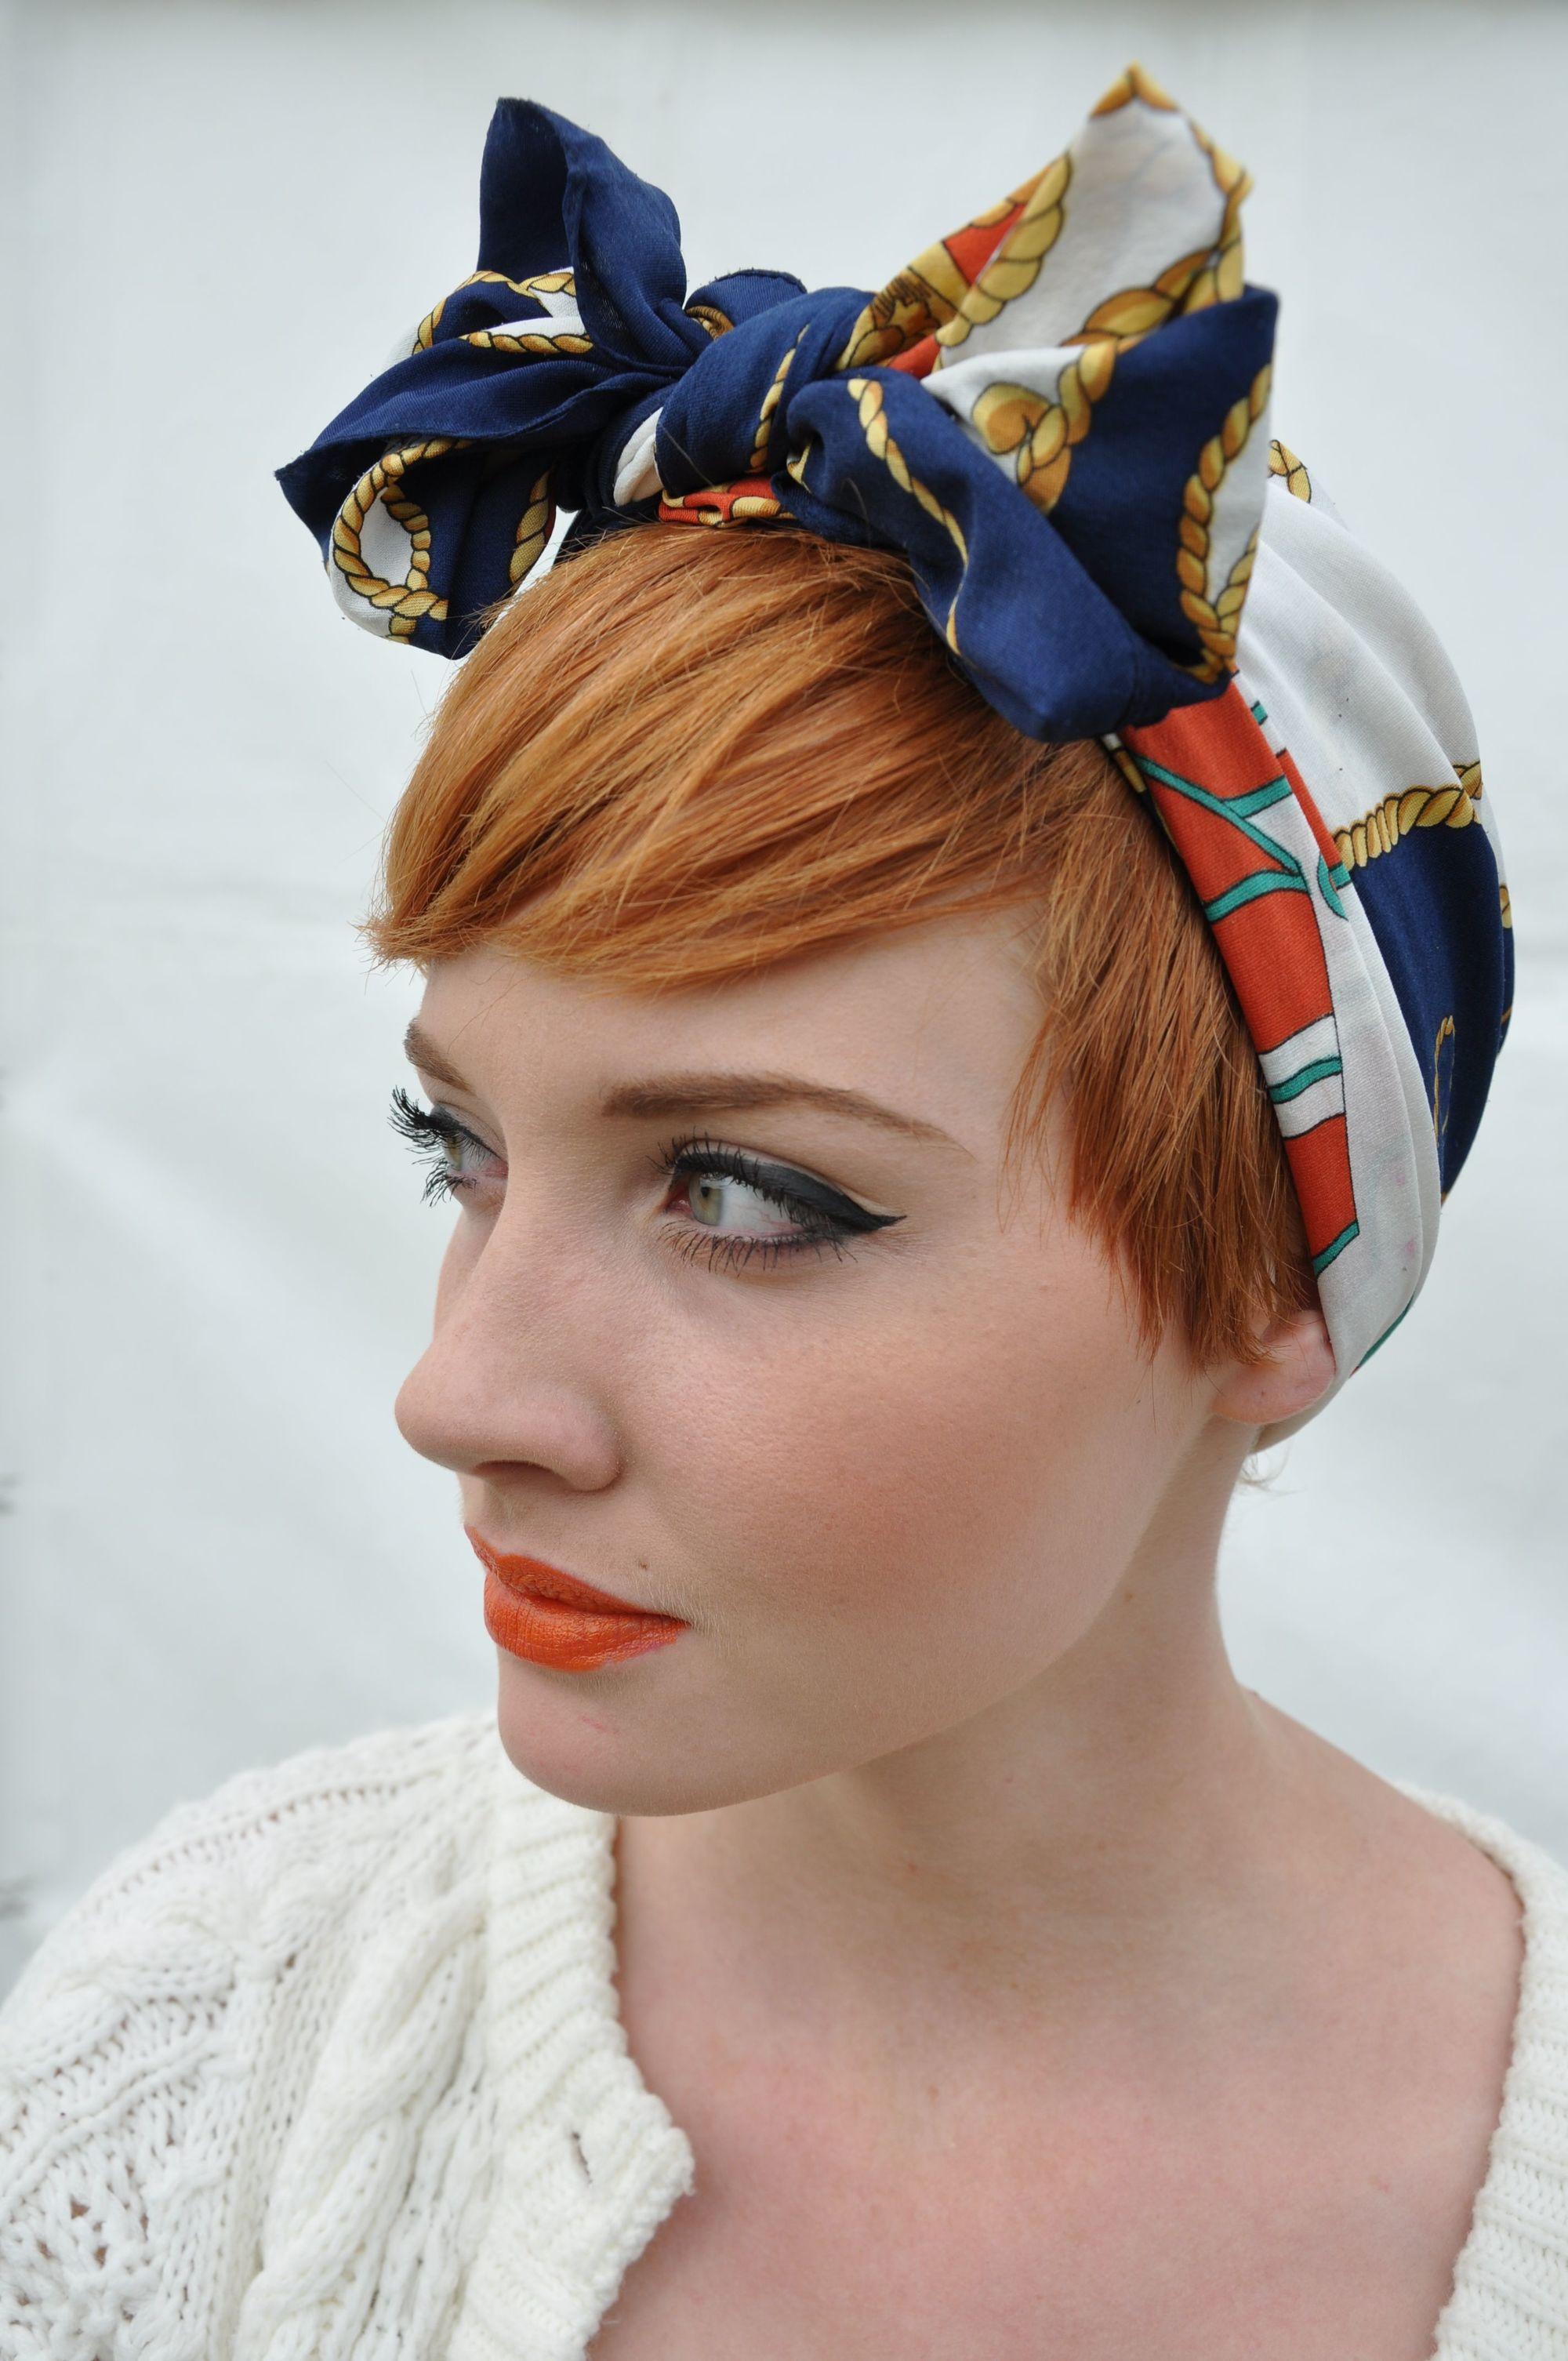 chica con pañuelo vintage